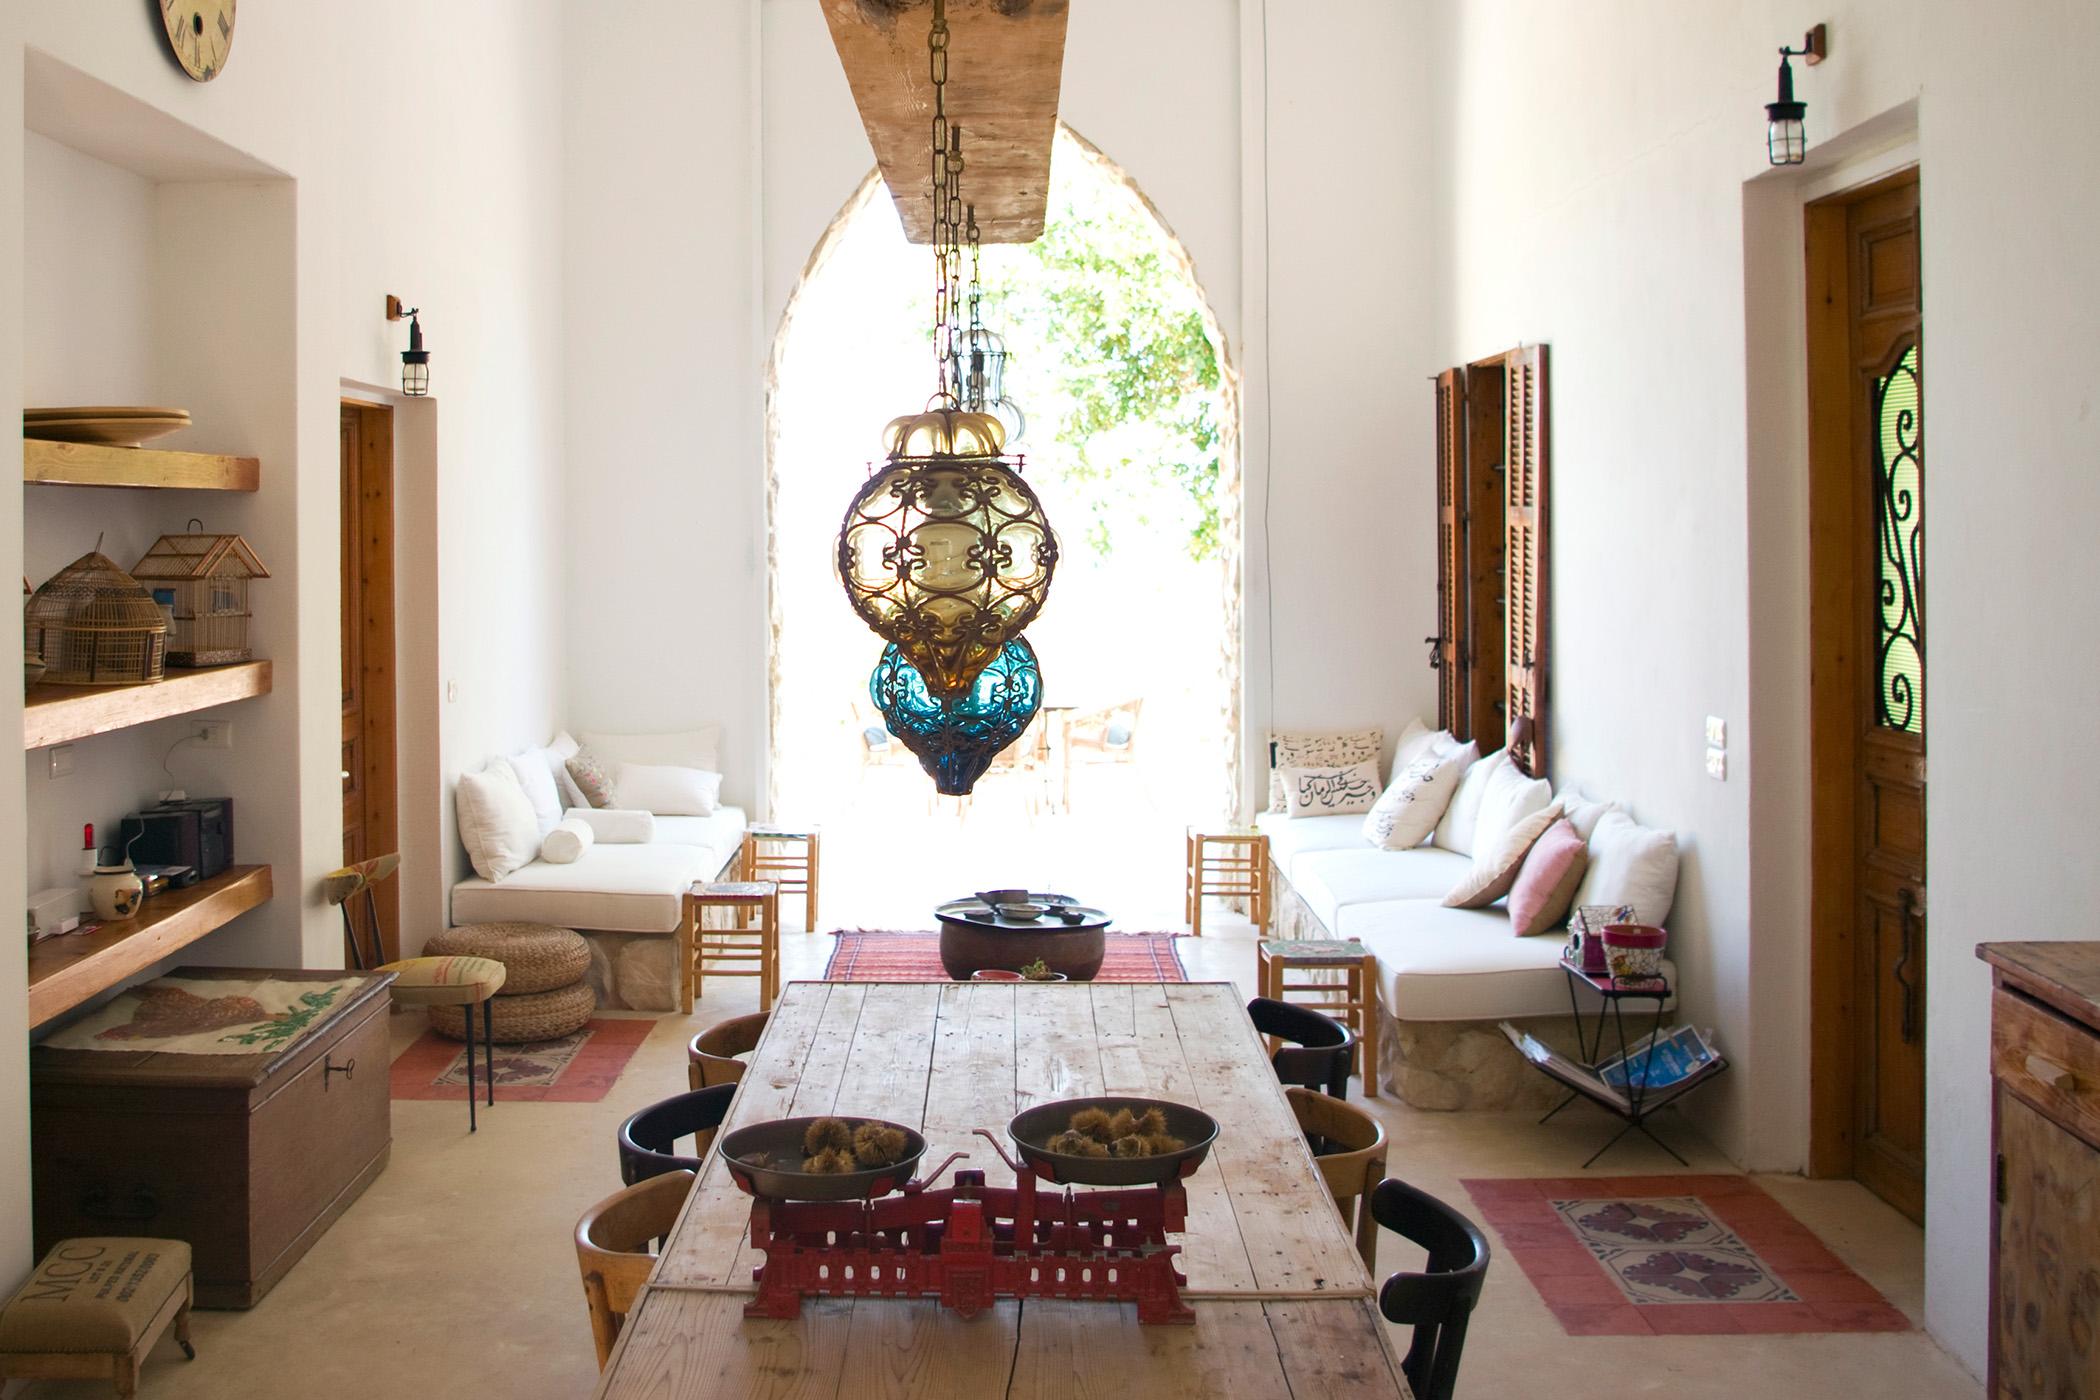 Beit Al Batroun Guesthouse